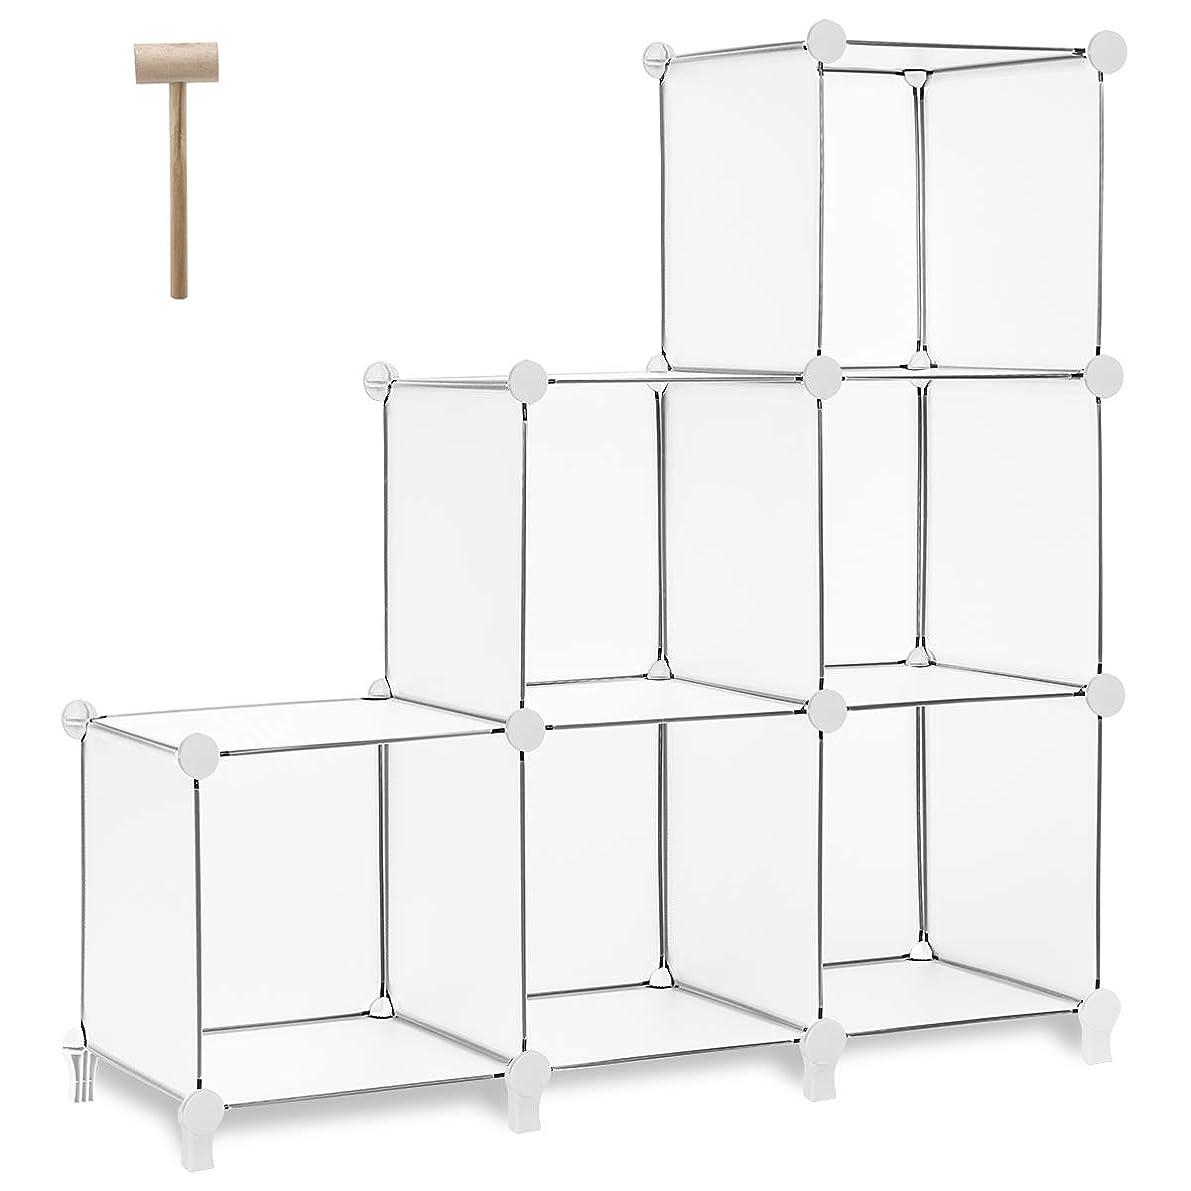 TomCare Cube Storage 6-Cube Bookshelf Closet Organizer Storage Shelves Shelf Cubes Organizer Plastic Square Book Shelf Bookcase DIY Closet Cabinet Organizer Shelving for Home Office Bedroom, White